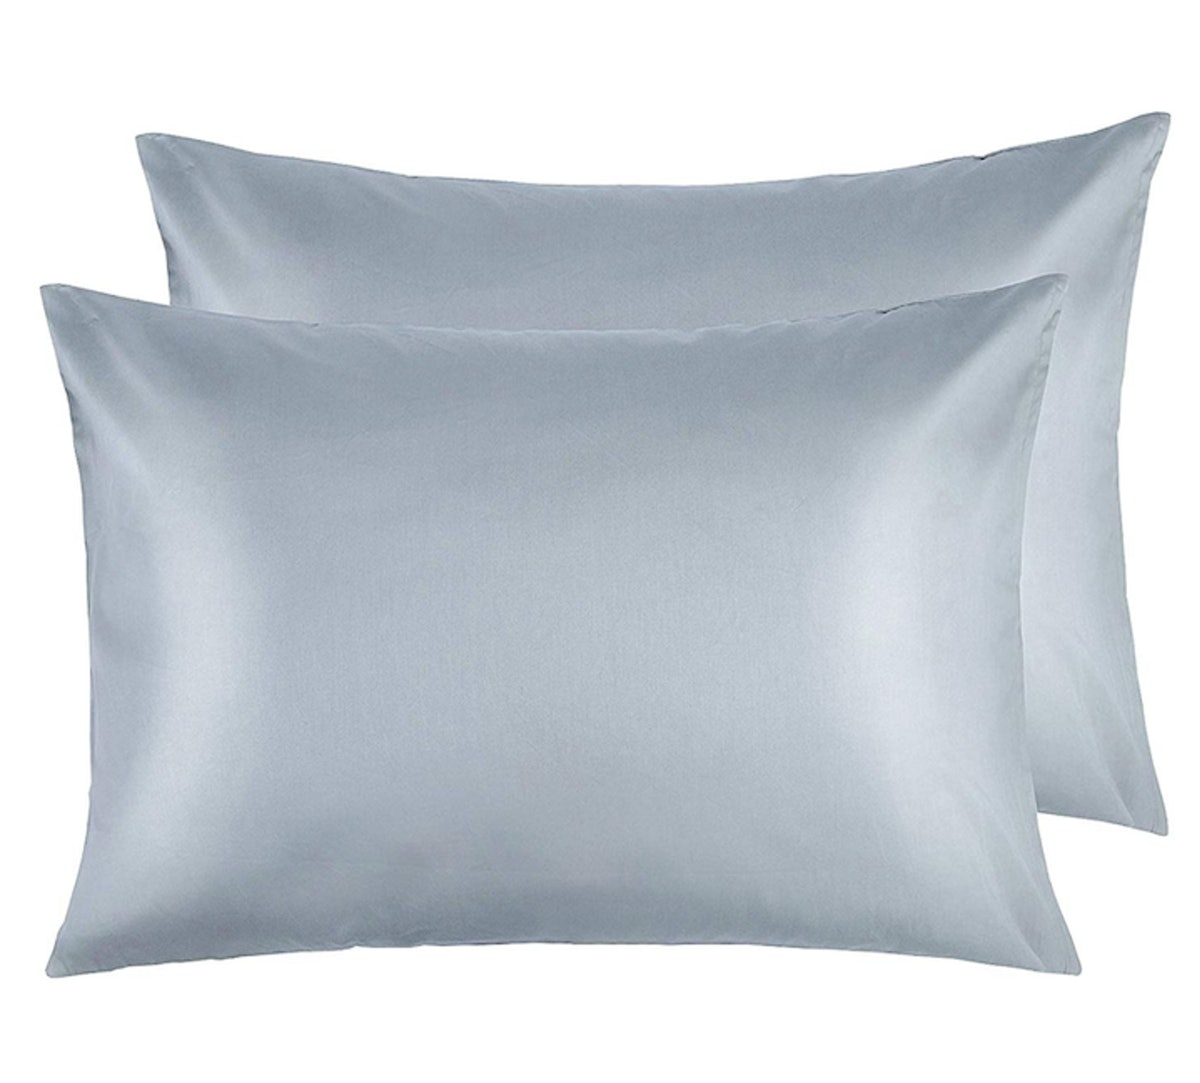 NTBAY Satin Pillowcases (Set Of 2)